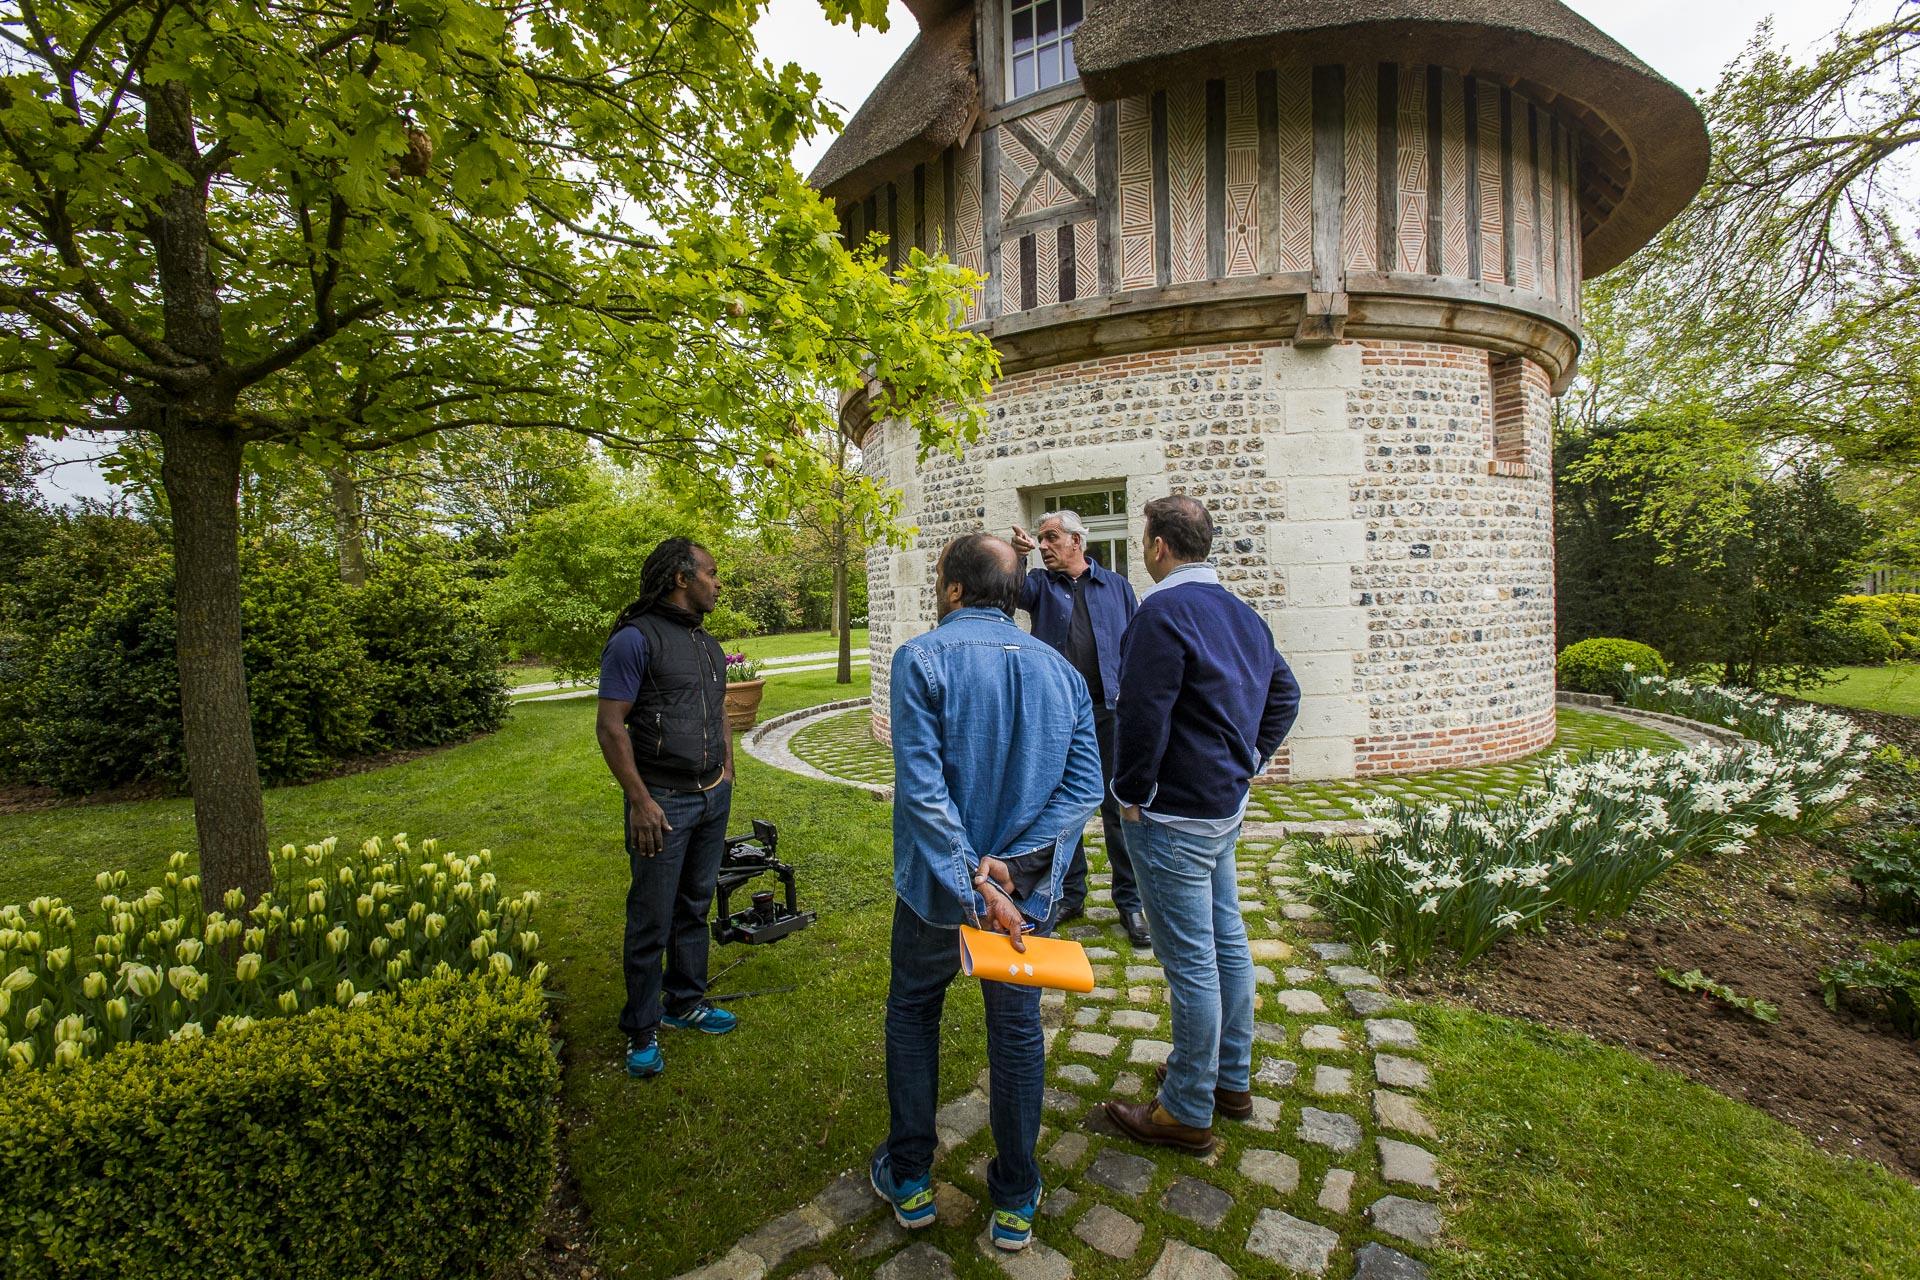 tournage_maison_france_5(C)s tephaneleroy-E61R1633-3.jpg